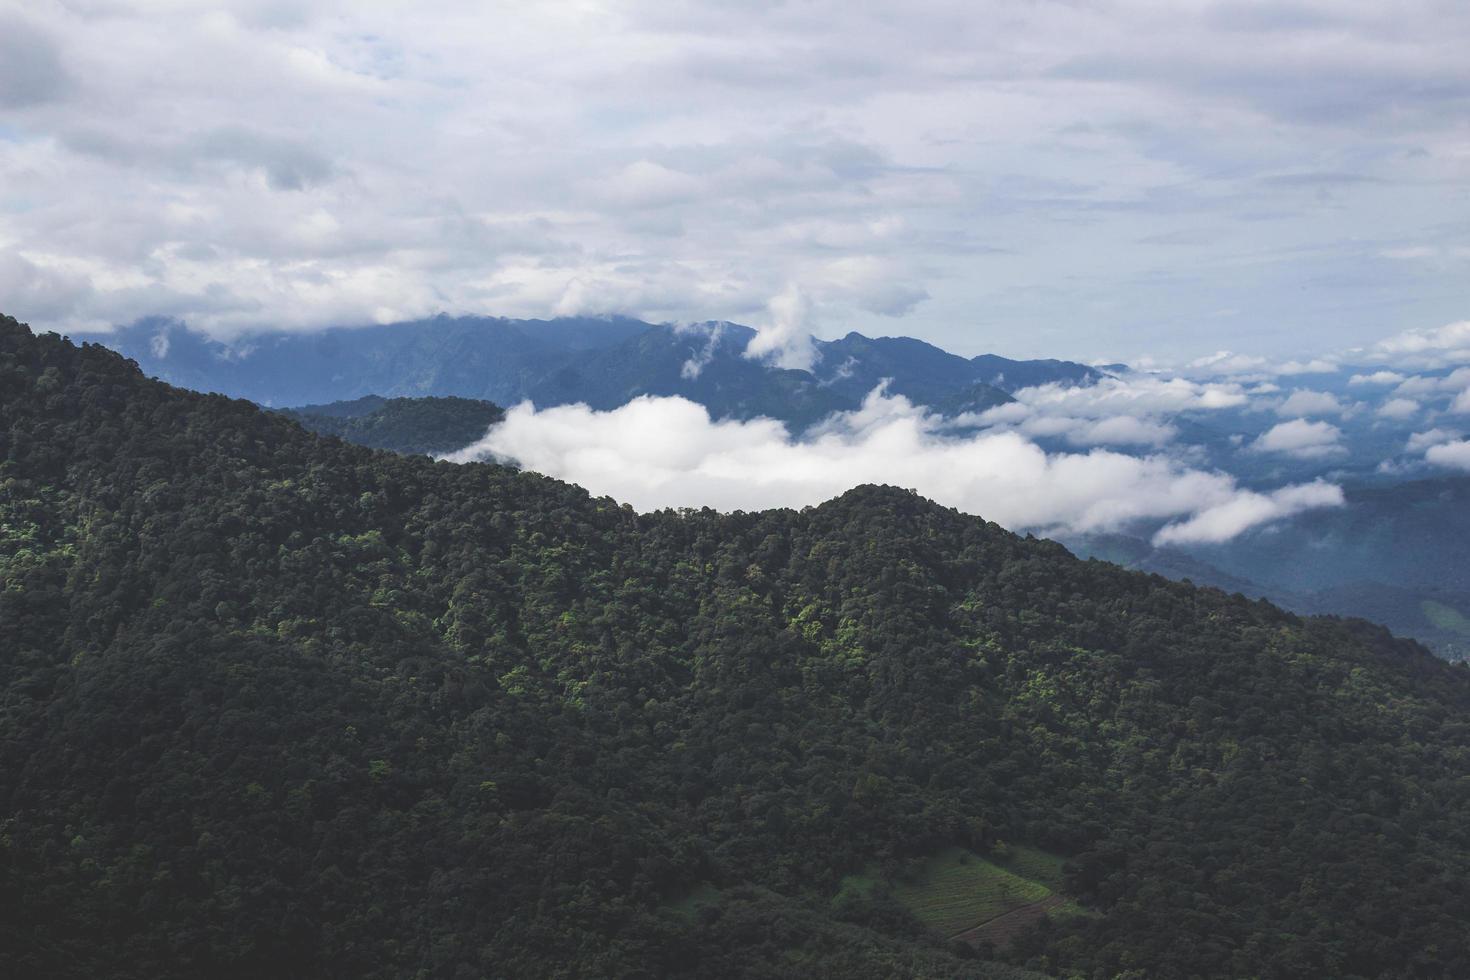 High angle photo of mountain range